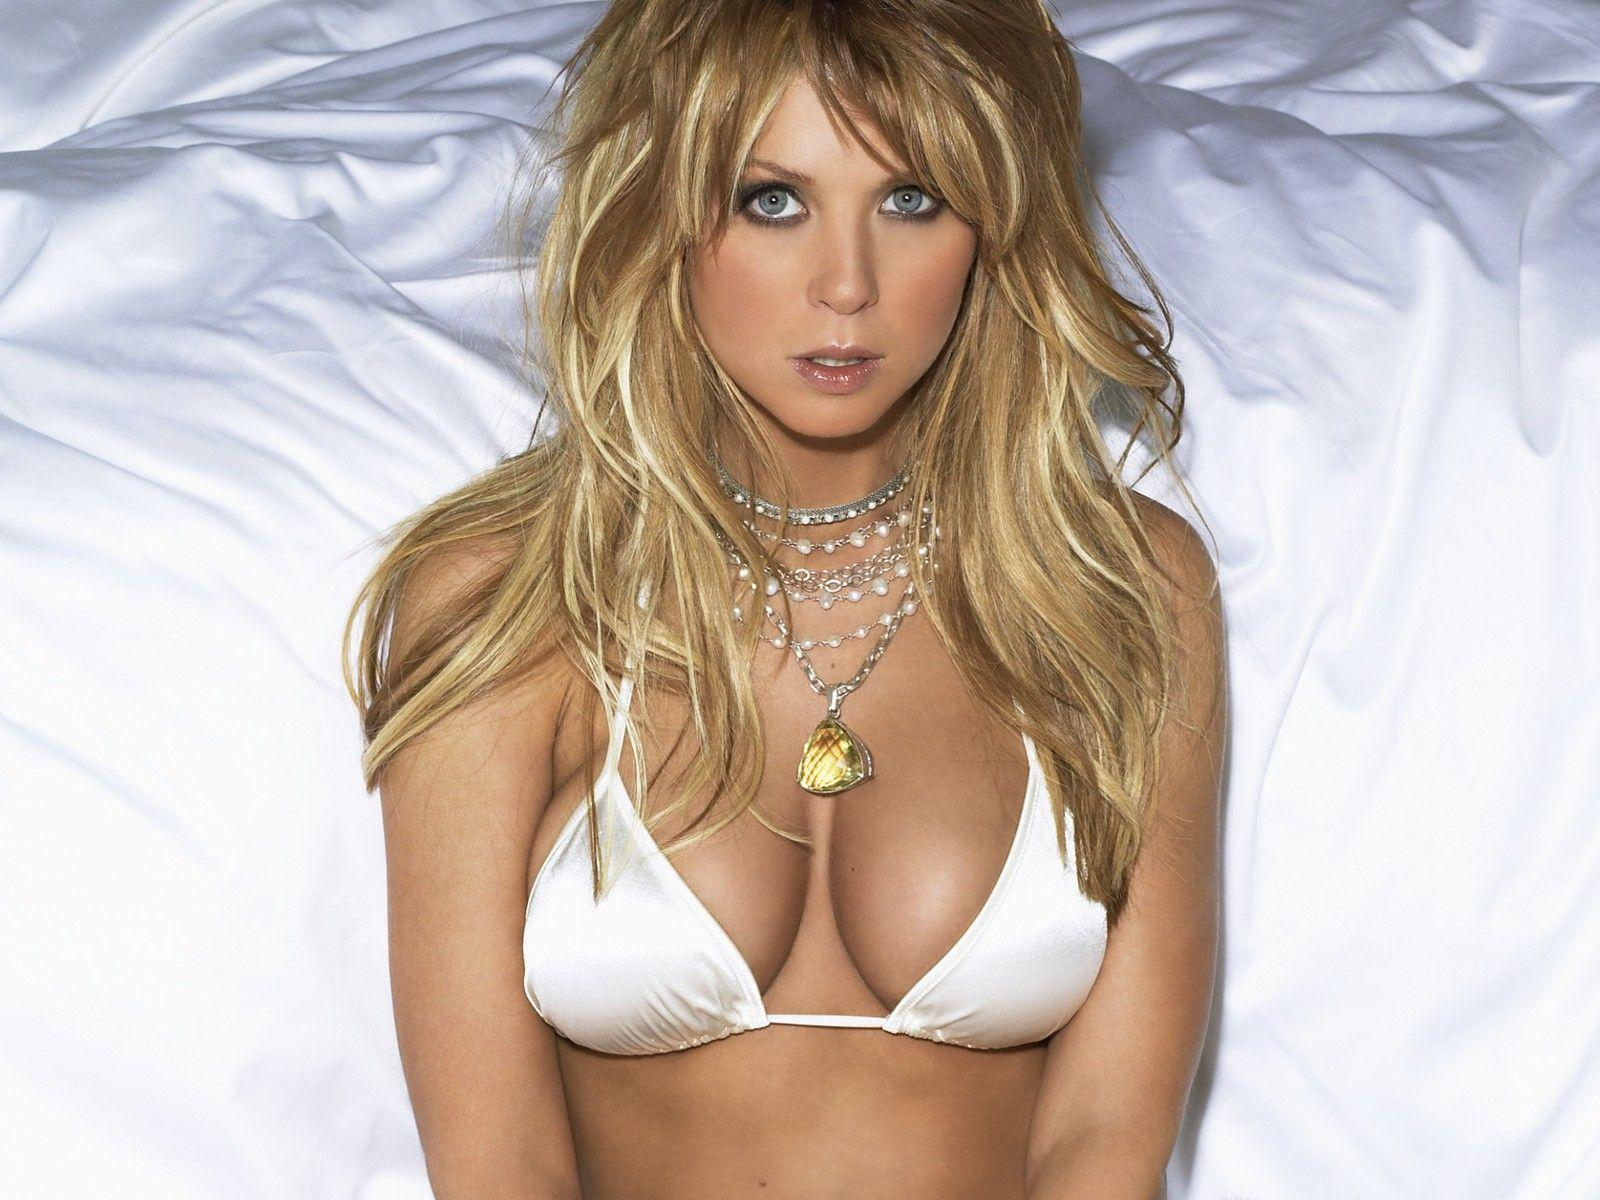 http://3.bp.blogspot.com/_gRl1tLJOW7Q/TLfe5vnXf_I/AAAAAAAABNY/PKdefINy6V4/s1600/tara_reid_hot_bikini_desktop_wallpaper_57890_raj.jpg